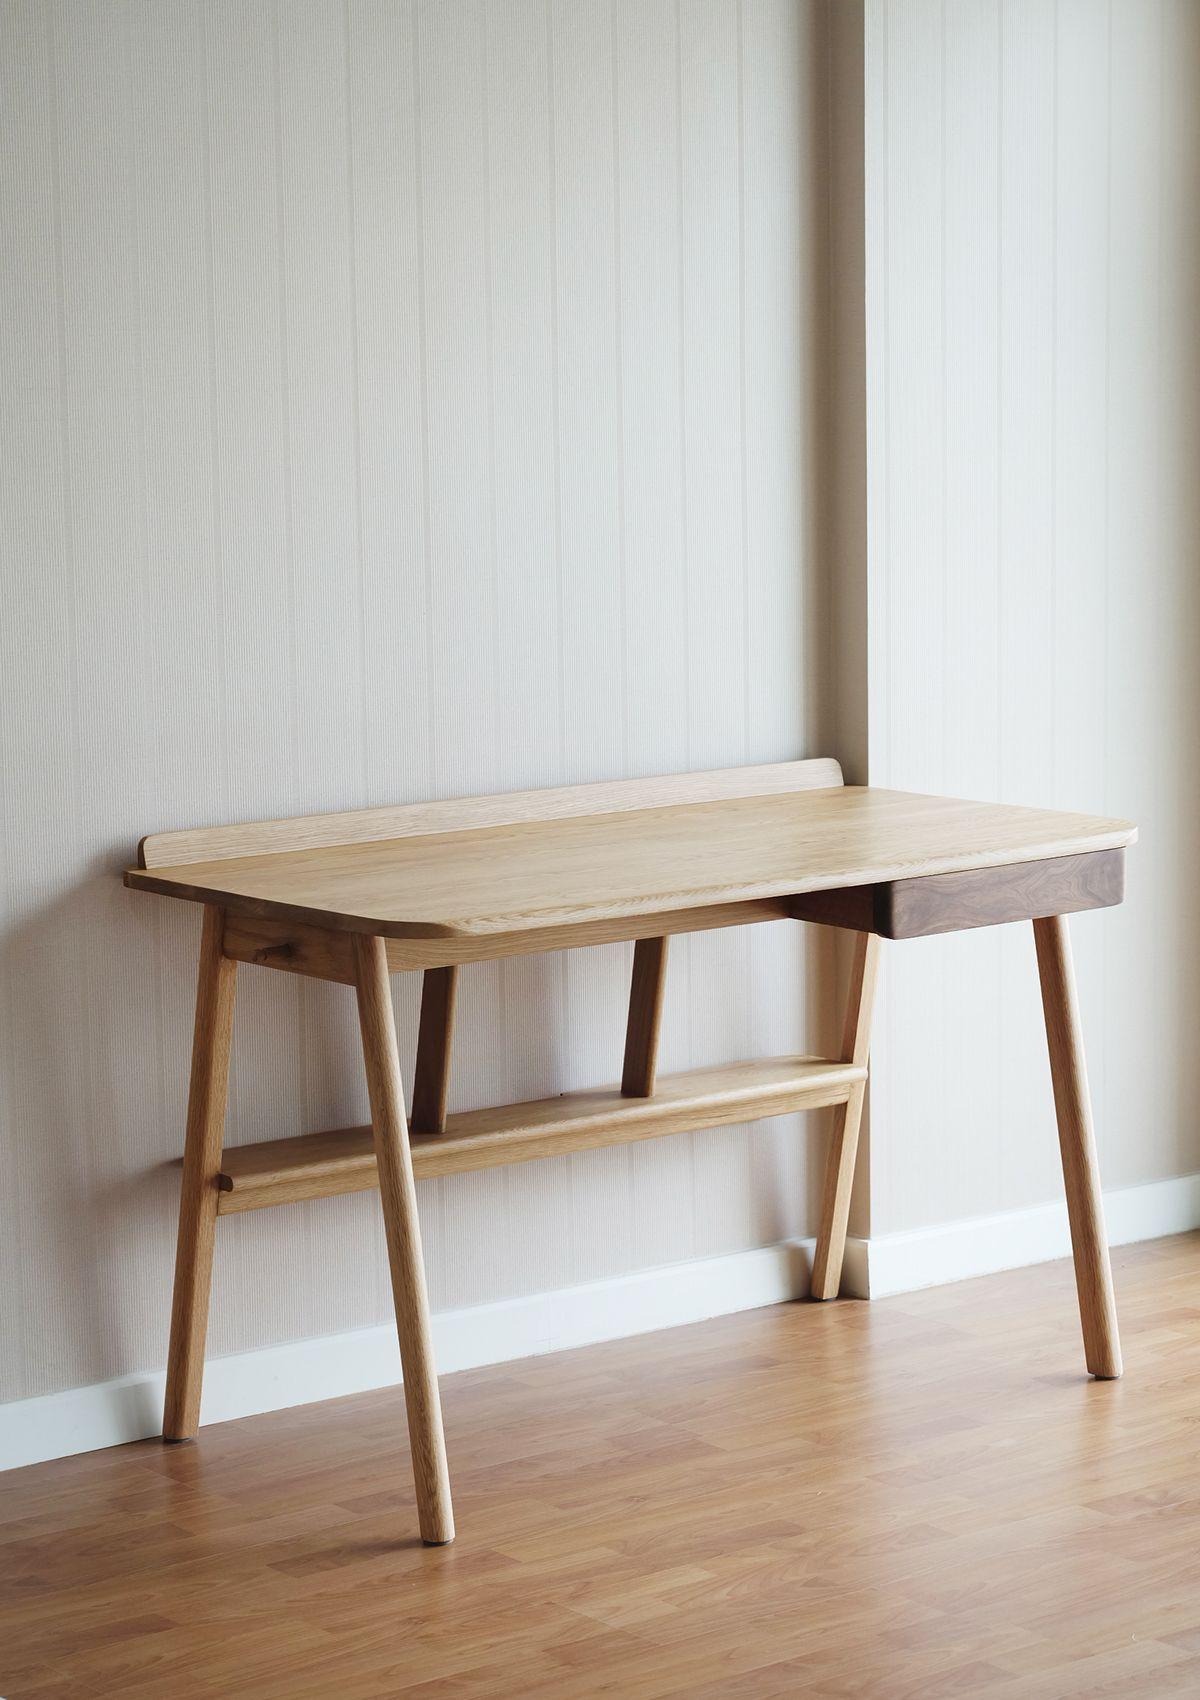 kitt desk furniture minimalist desk wood desk table furniture rh pinterest com